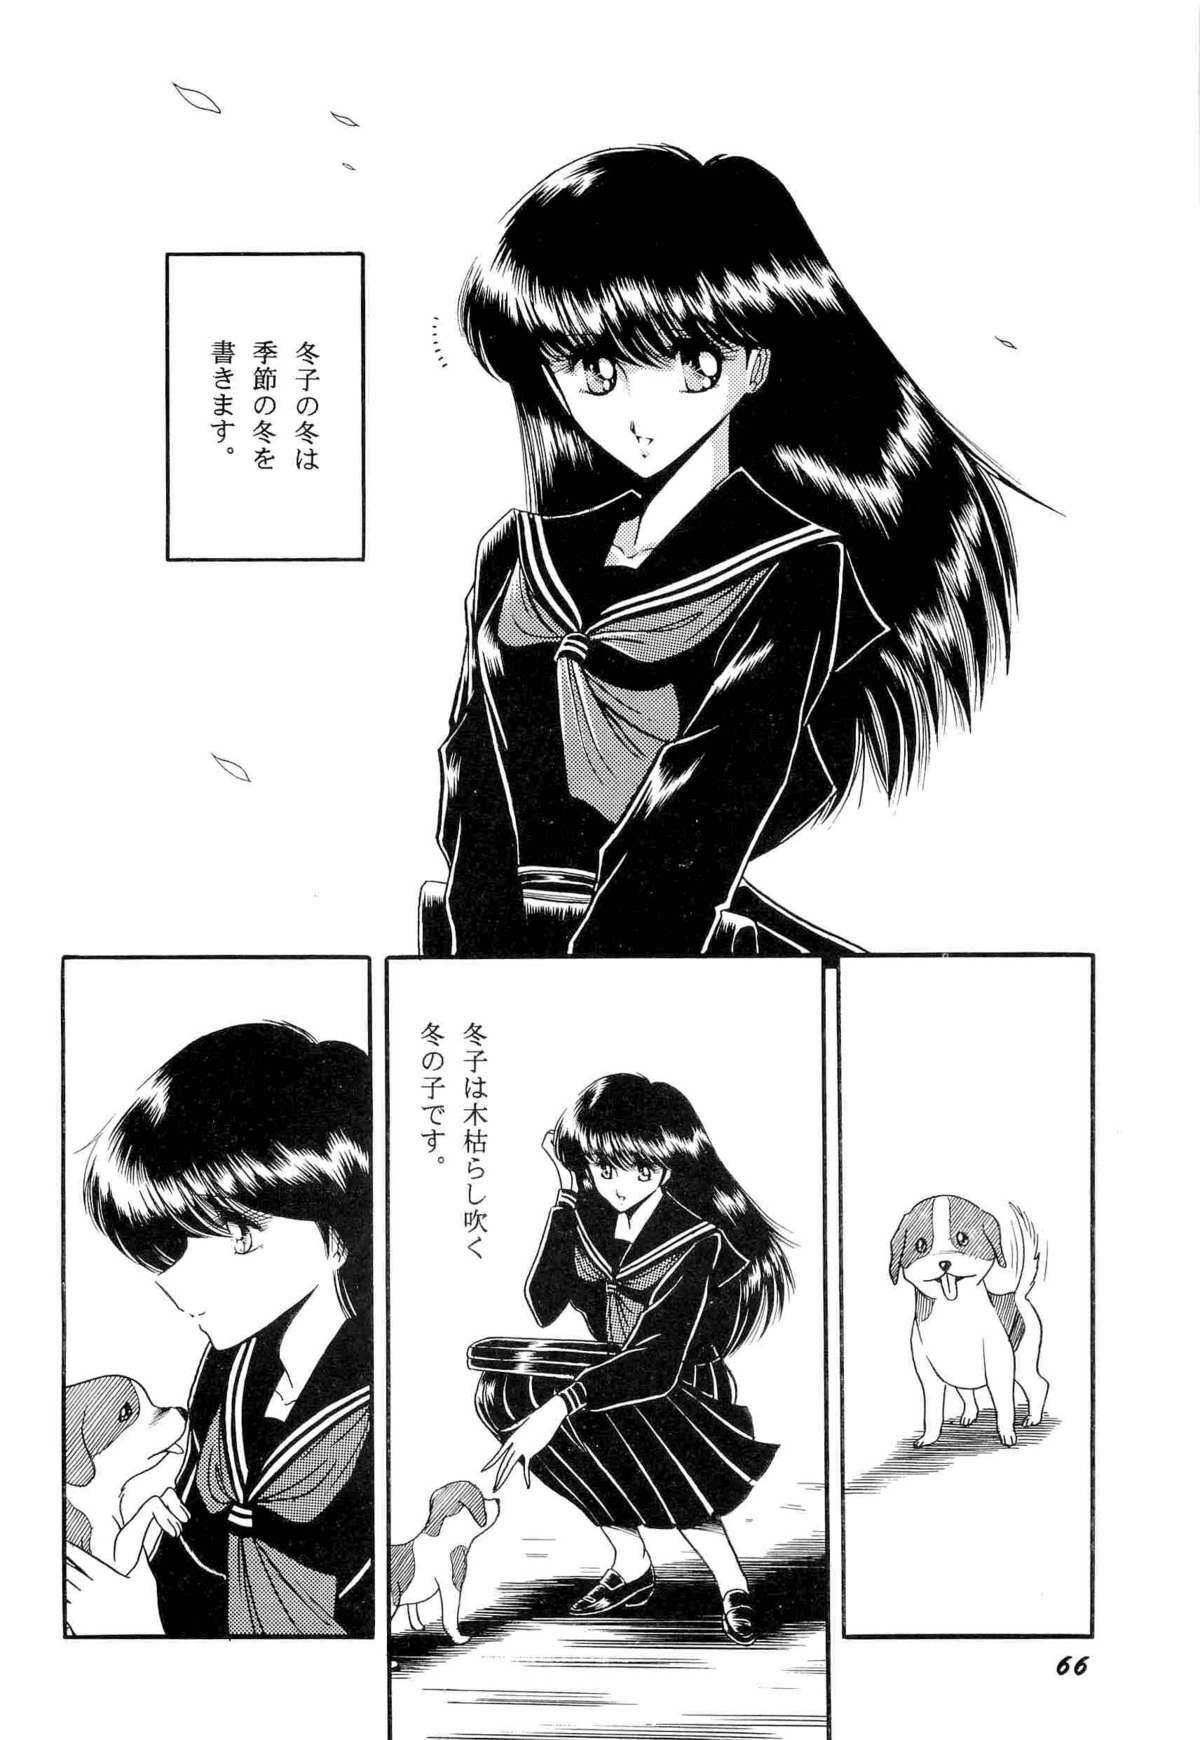 Bisyoujo Anthology '93 jyoukan 69